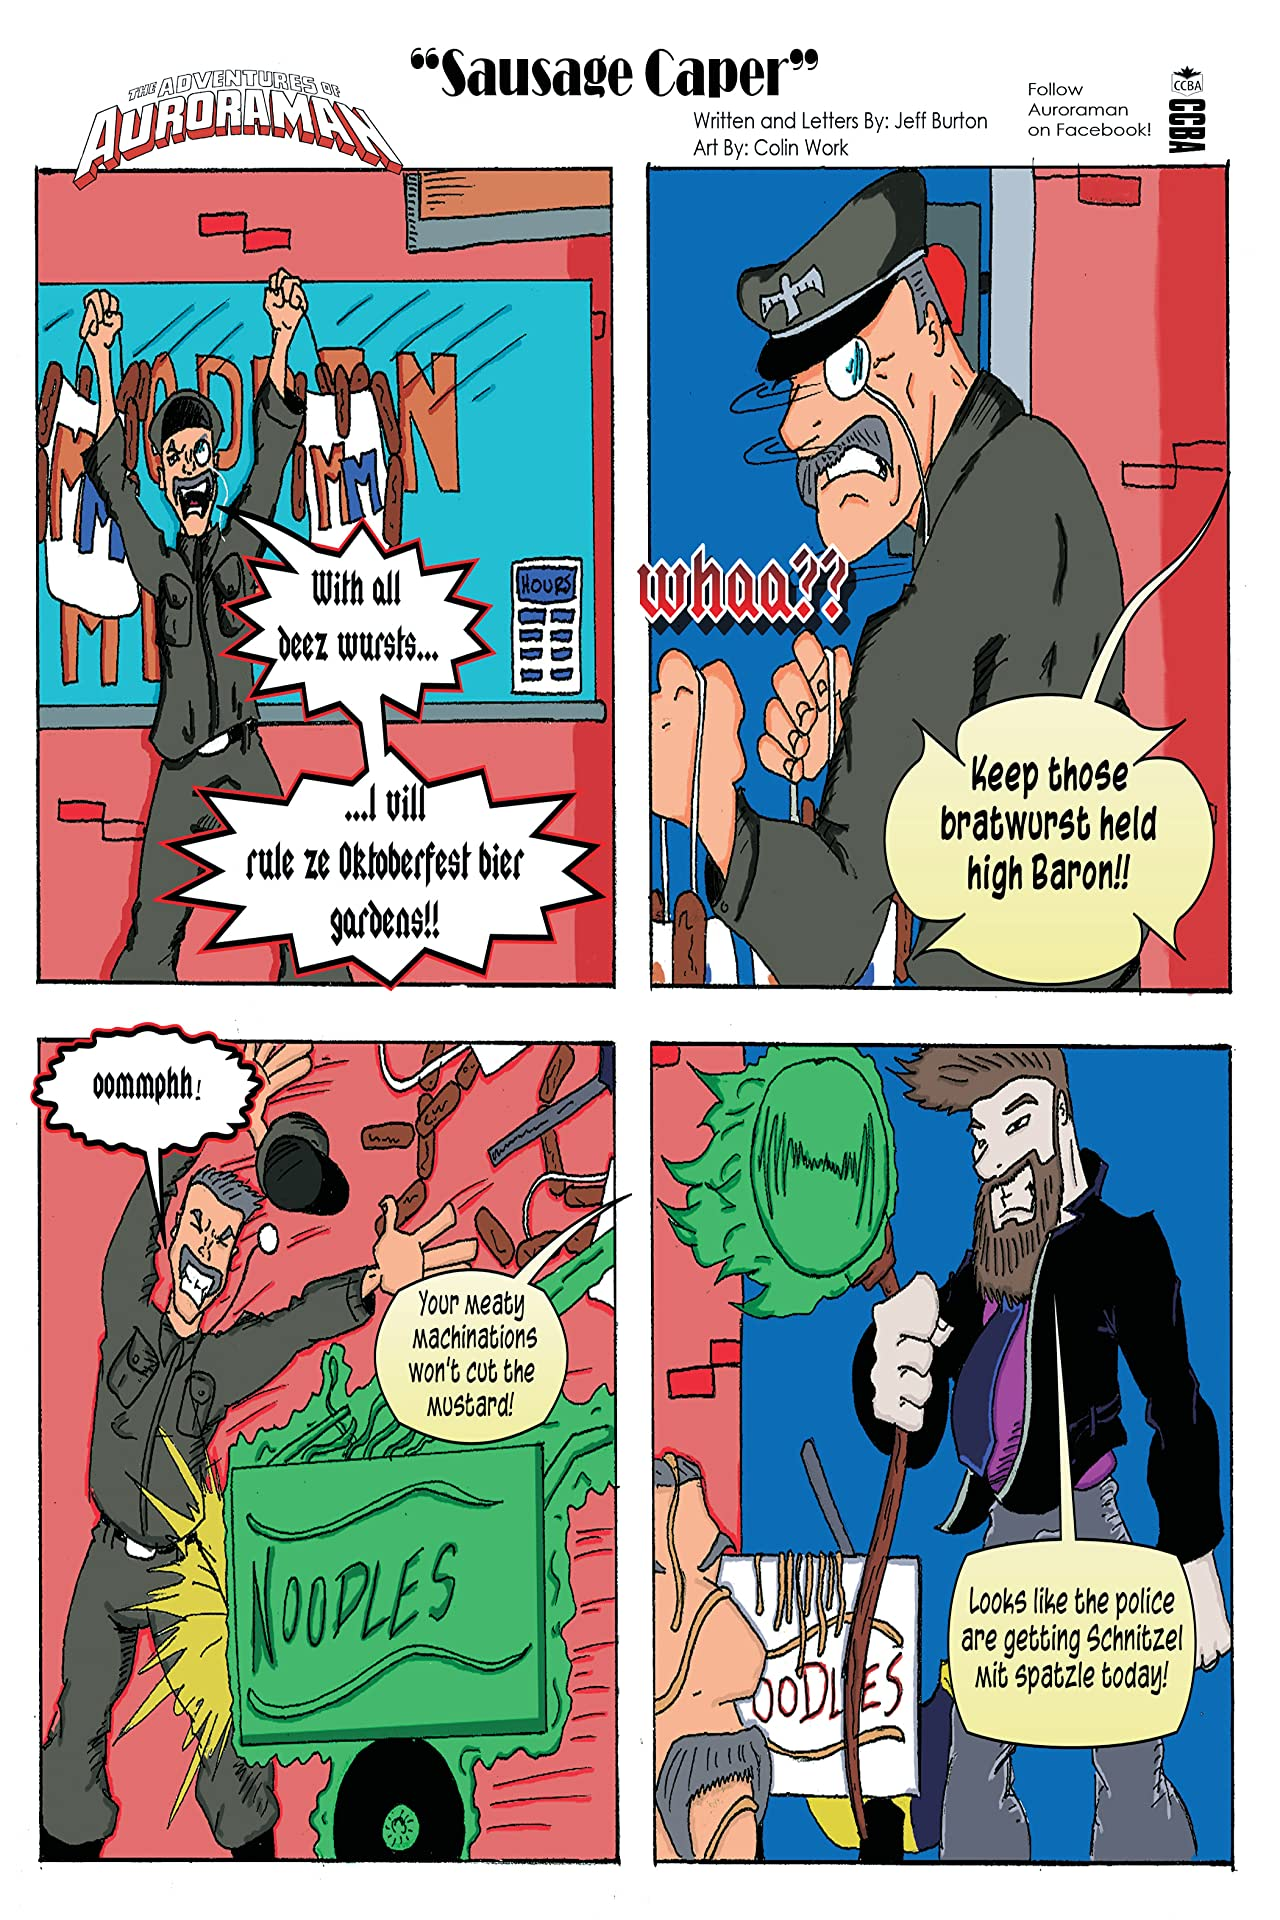 The Adventures of Auroraman: Season 2